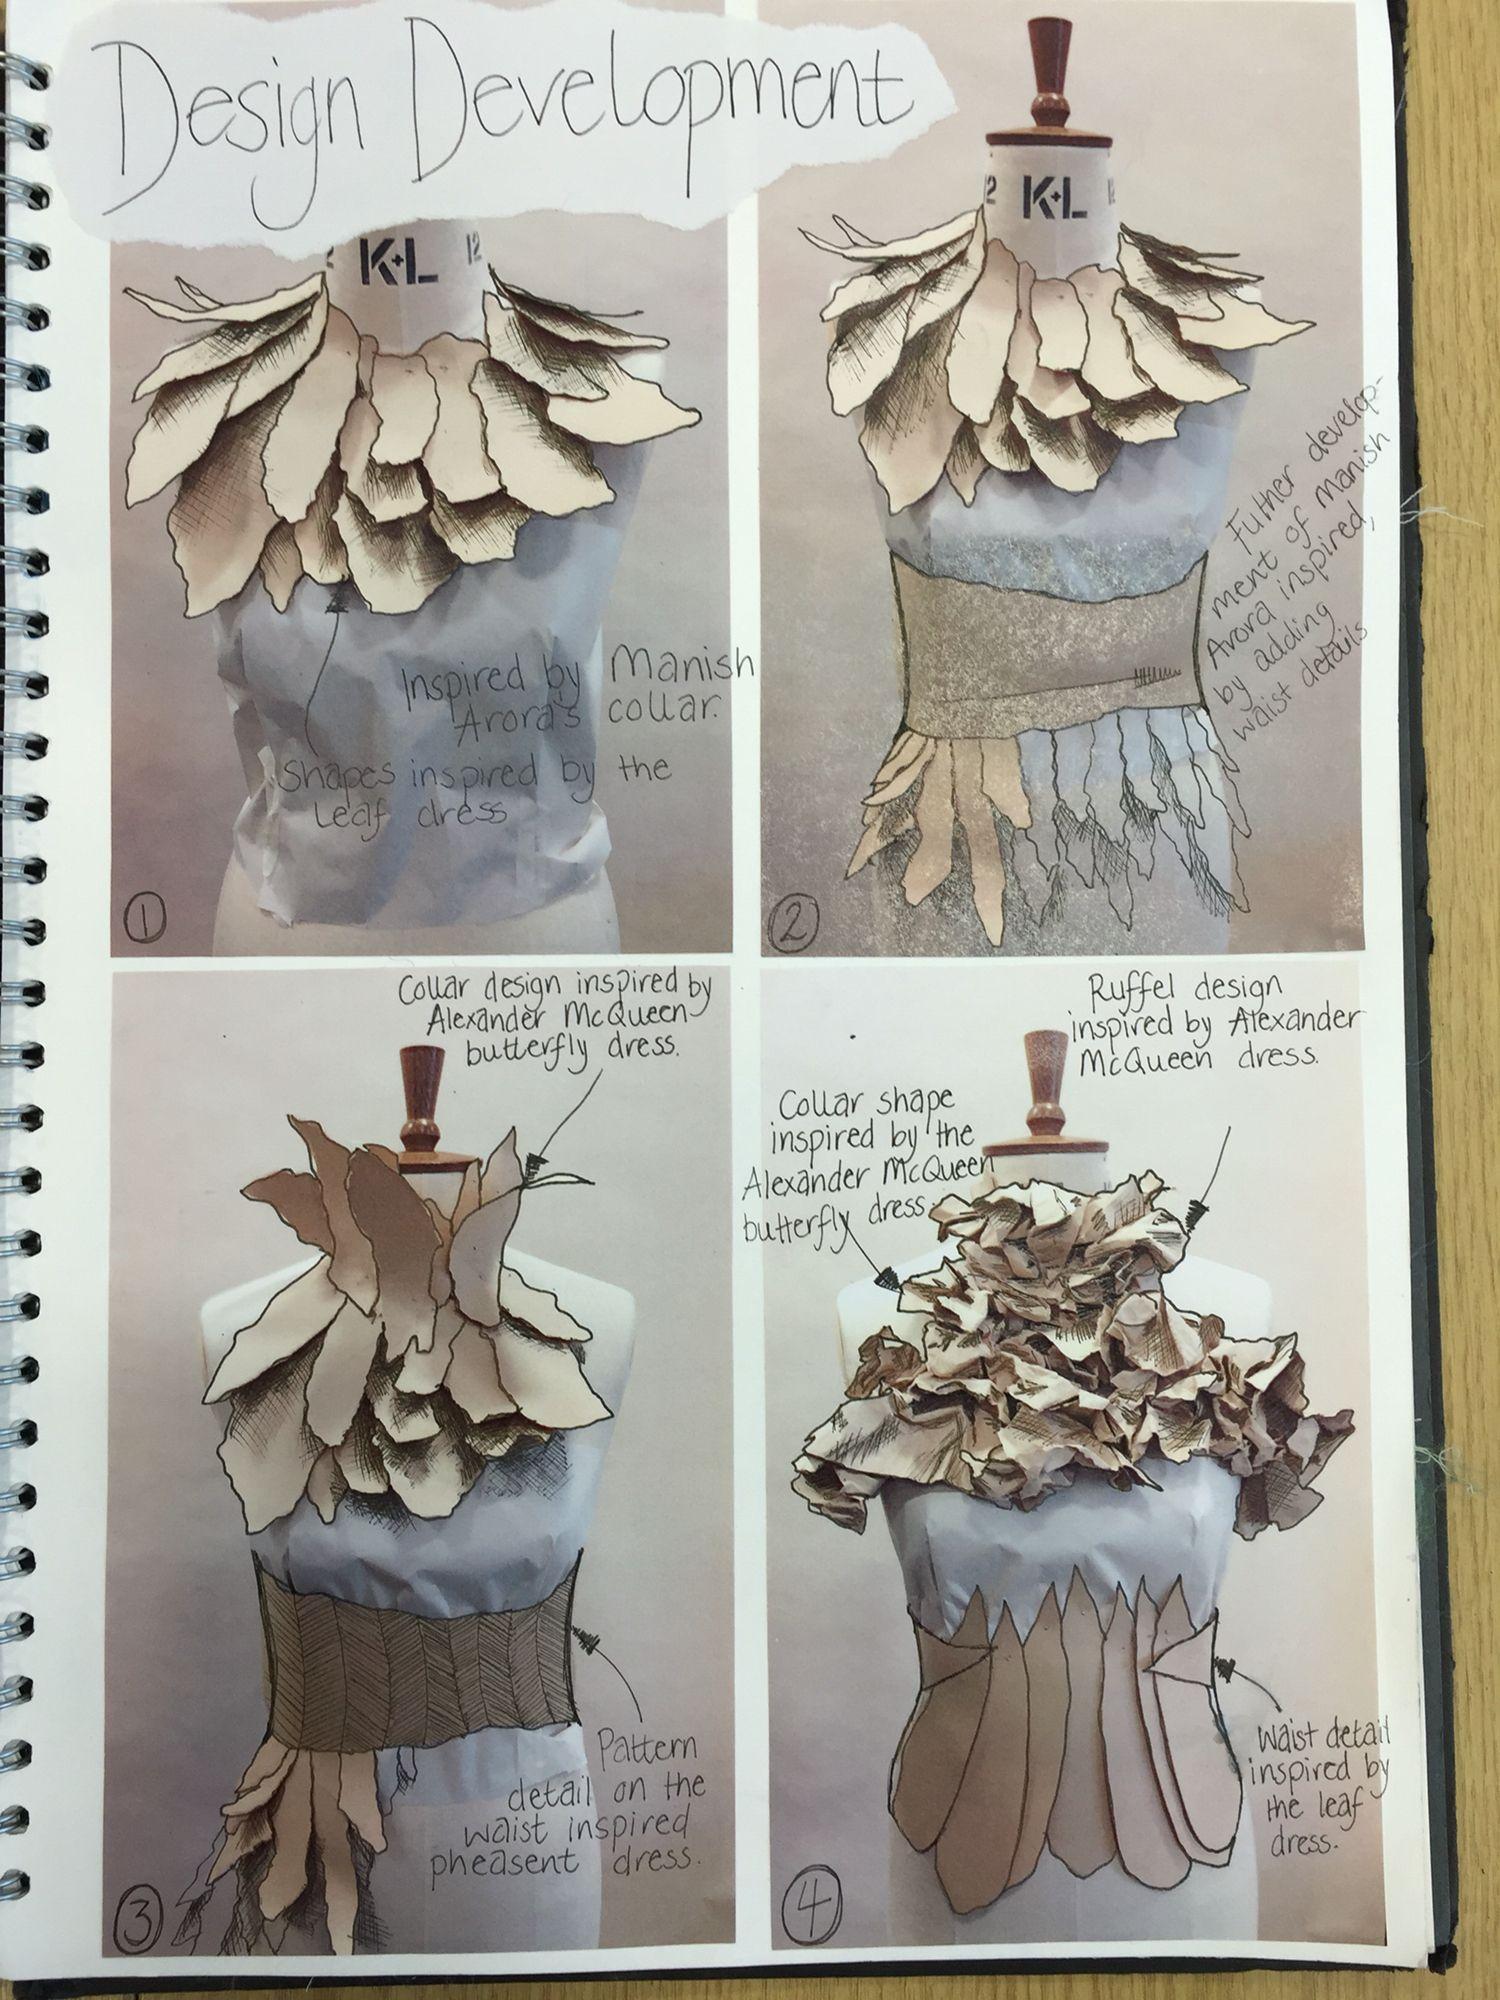 Developing A Range Of Design Ideas On The Mannequin Emma Fashion Design Sketchbook Fashion Design Portfolio Textiles Sketchbook